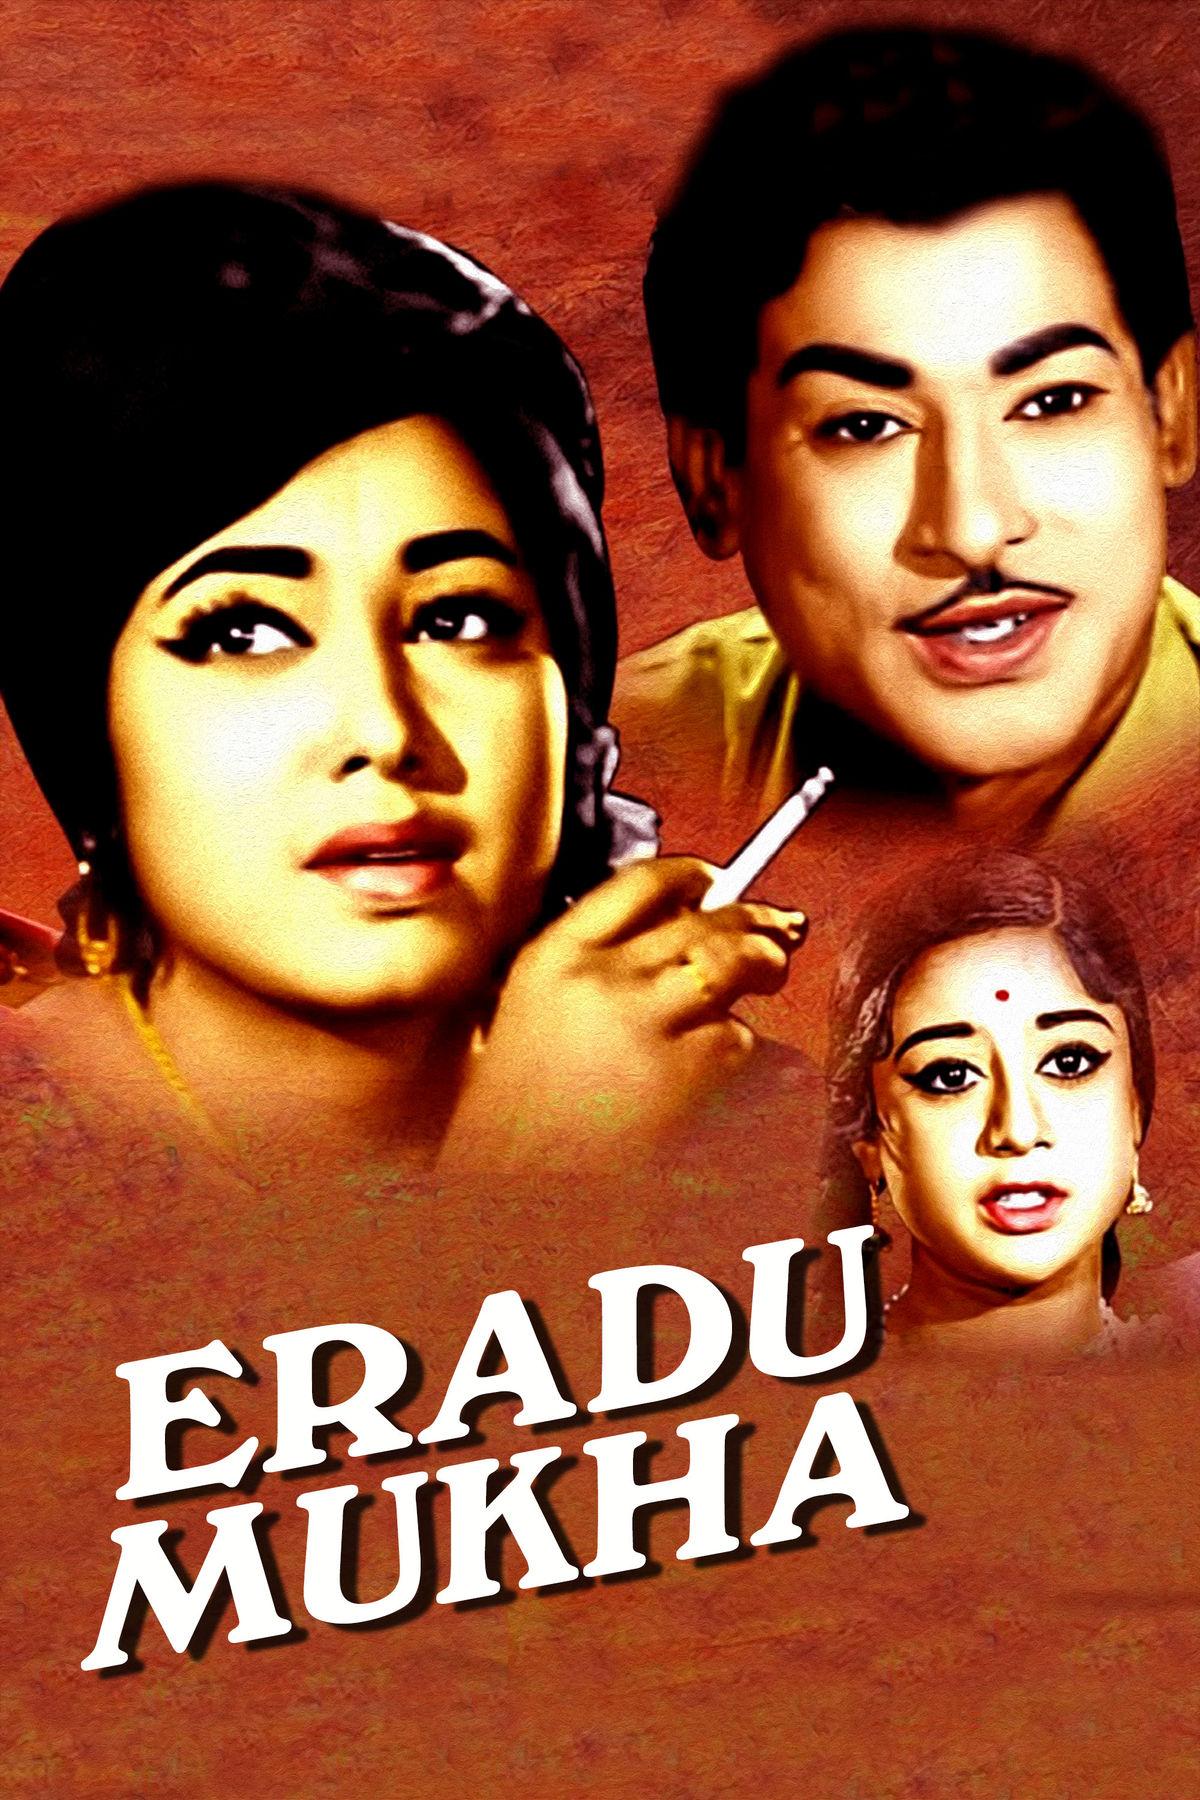 Eradu Mukha